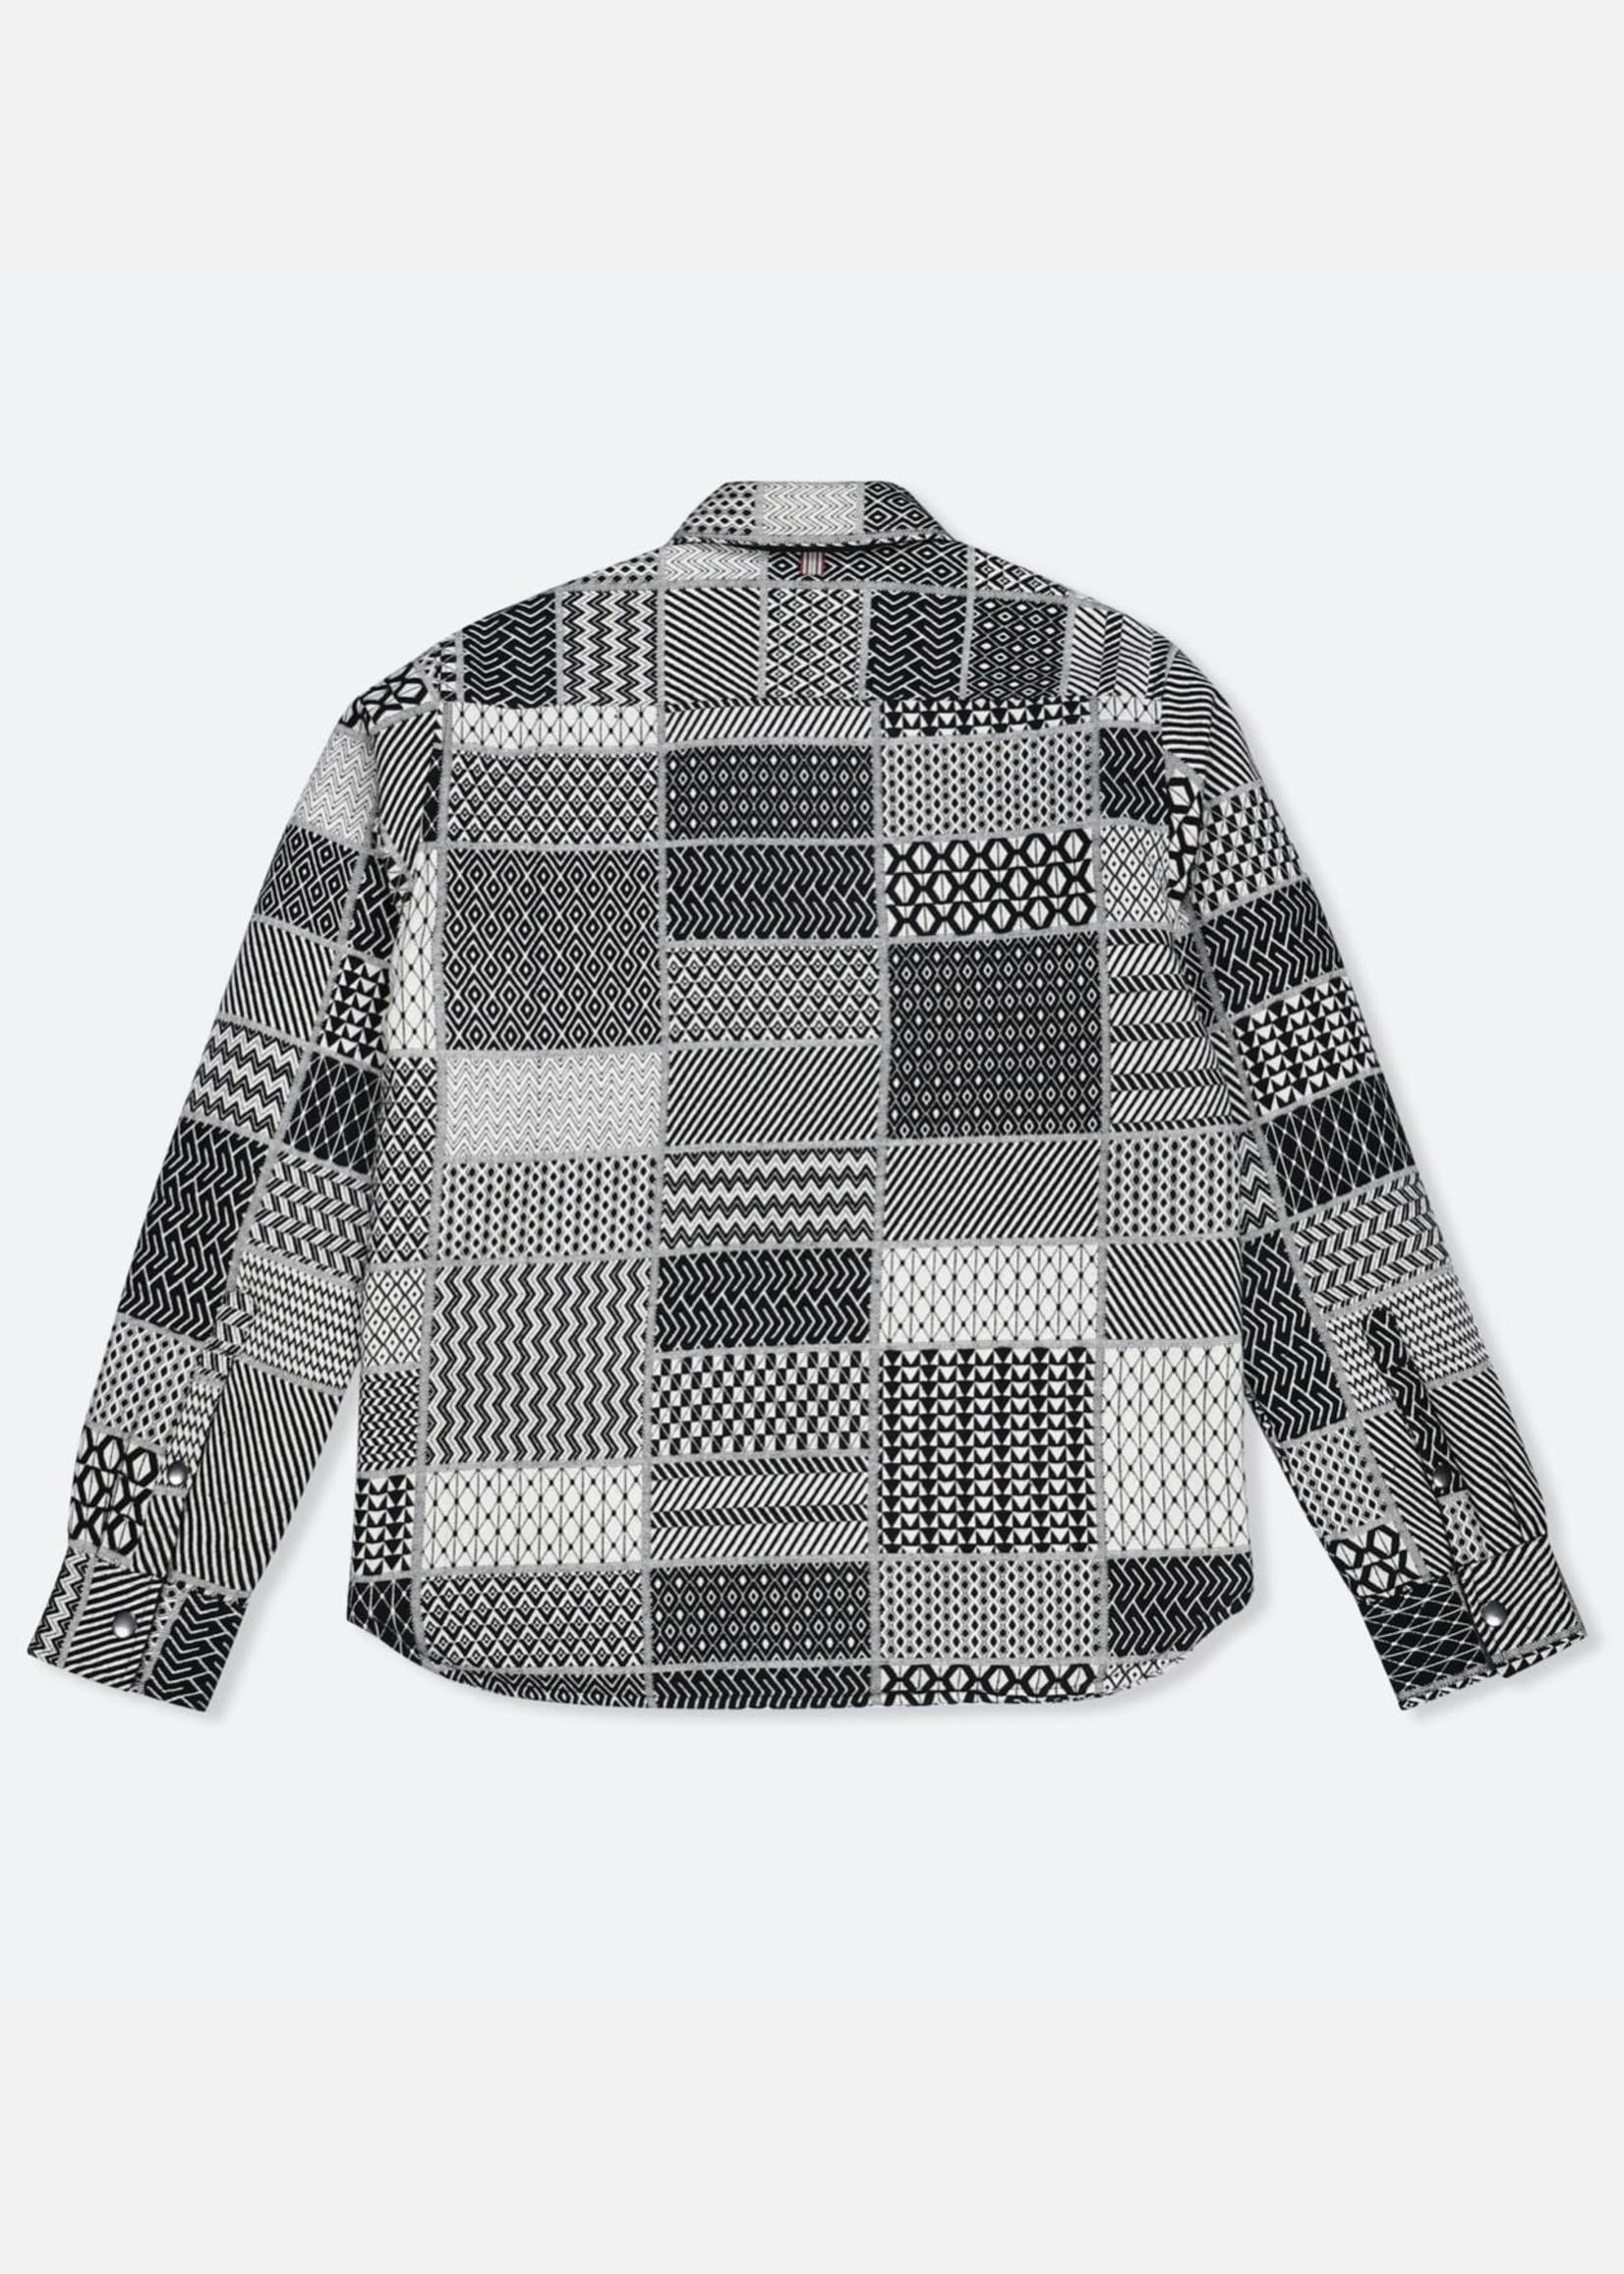 Kardo Kardo Woody Grey Abstract Patchwork Print Jacket